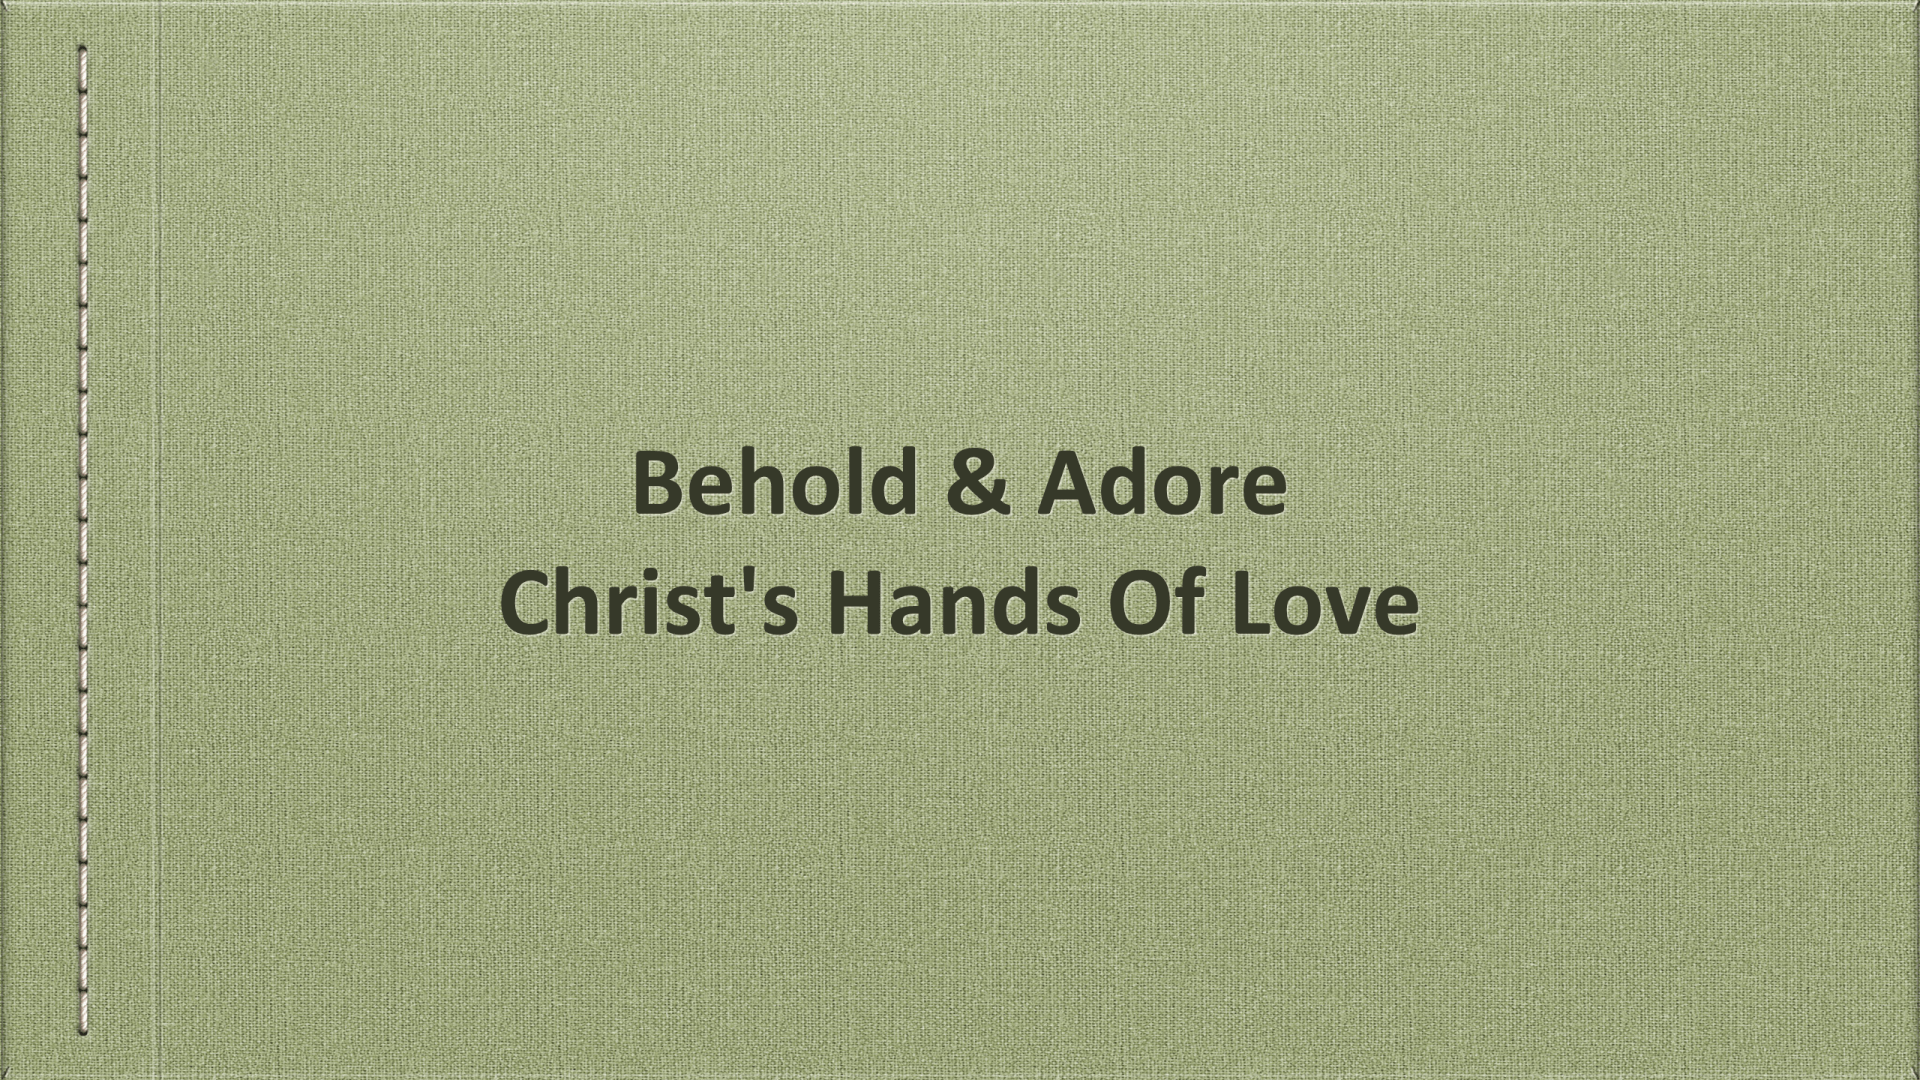 GCM-52 - The Hands Of God, Face Of God, And Feet Of God - In A Manger (5)